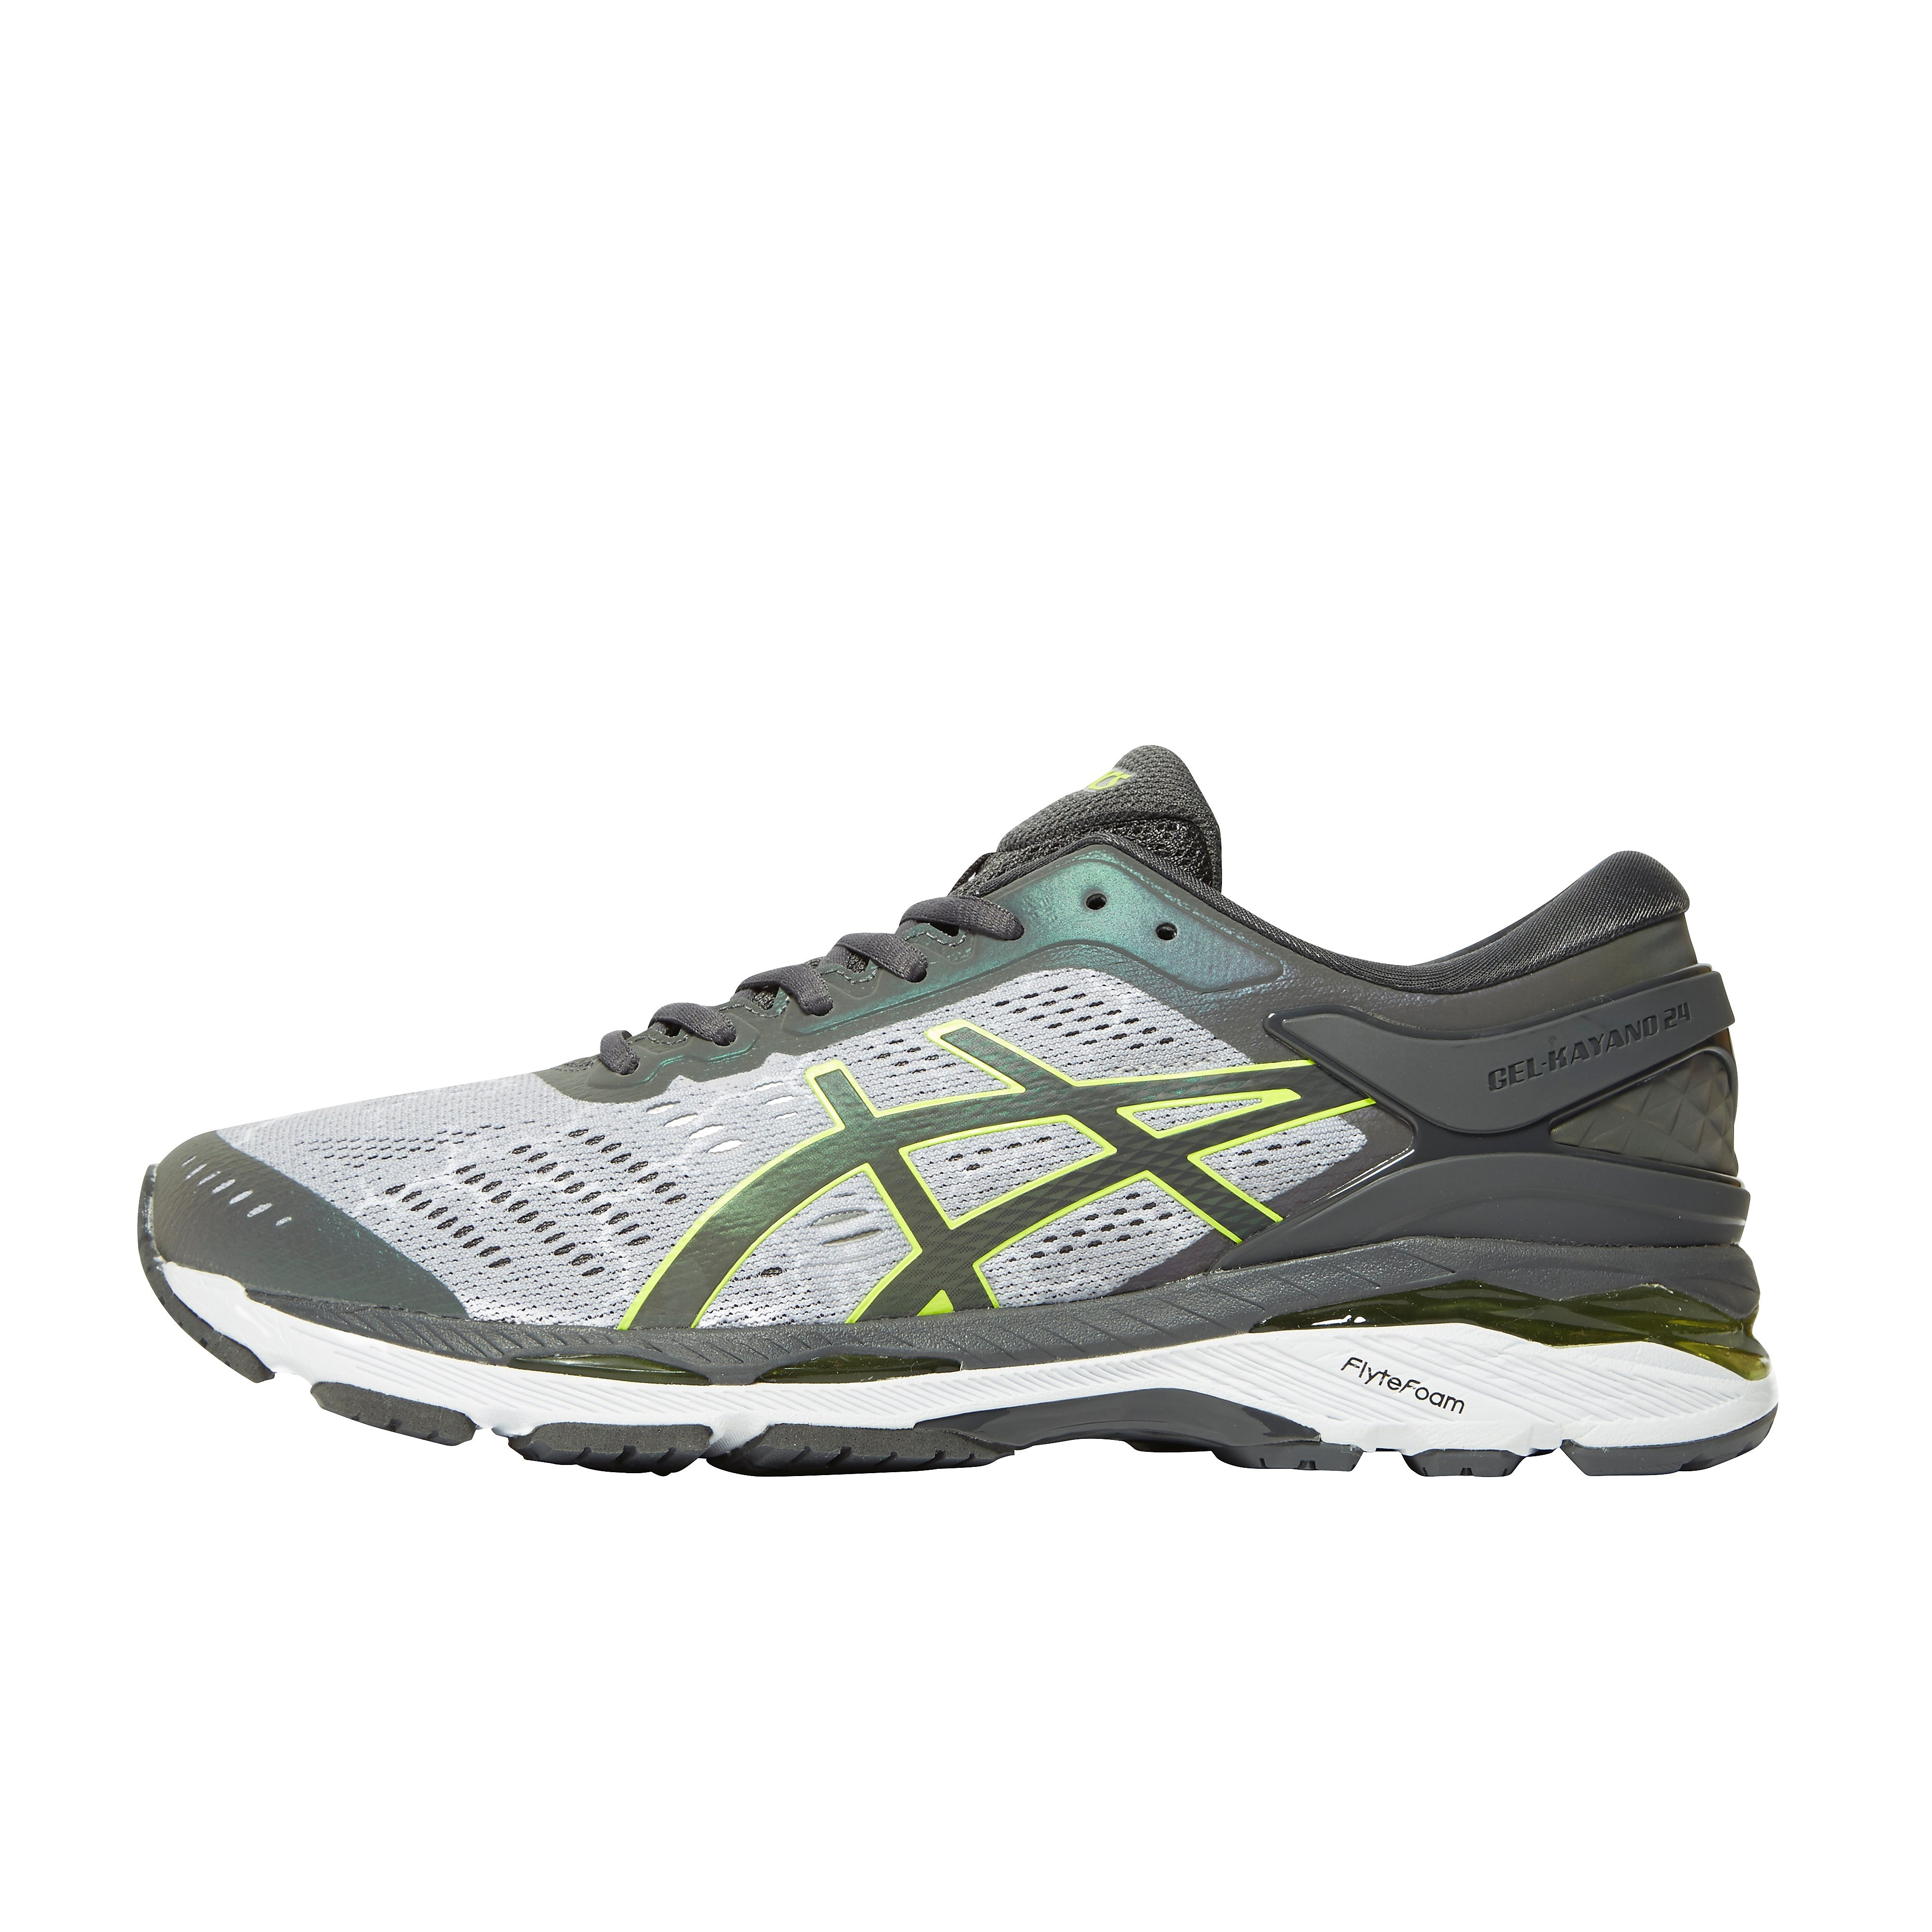 Men's ASICS Gel-Kayano 24 Lite-Show Running Shoes - Dark Grey, Dark Grey